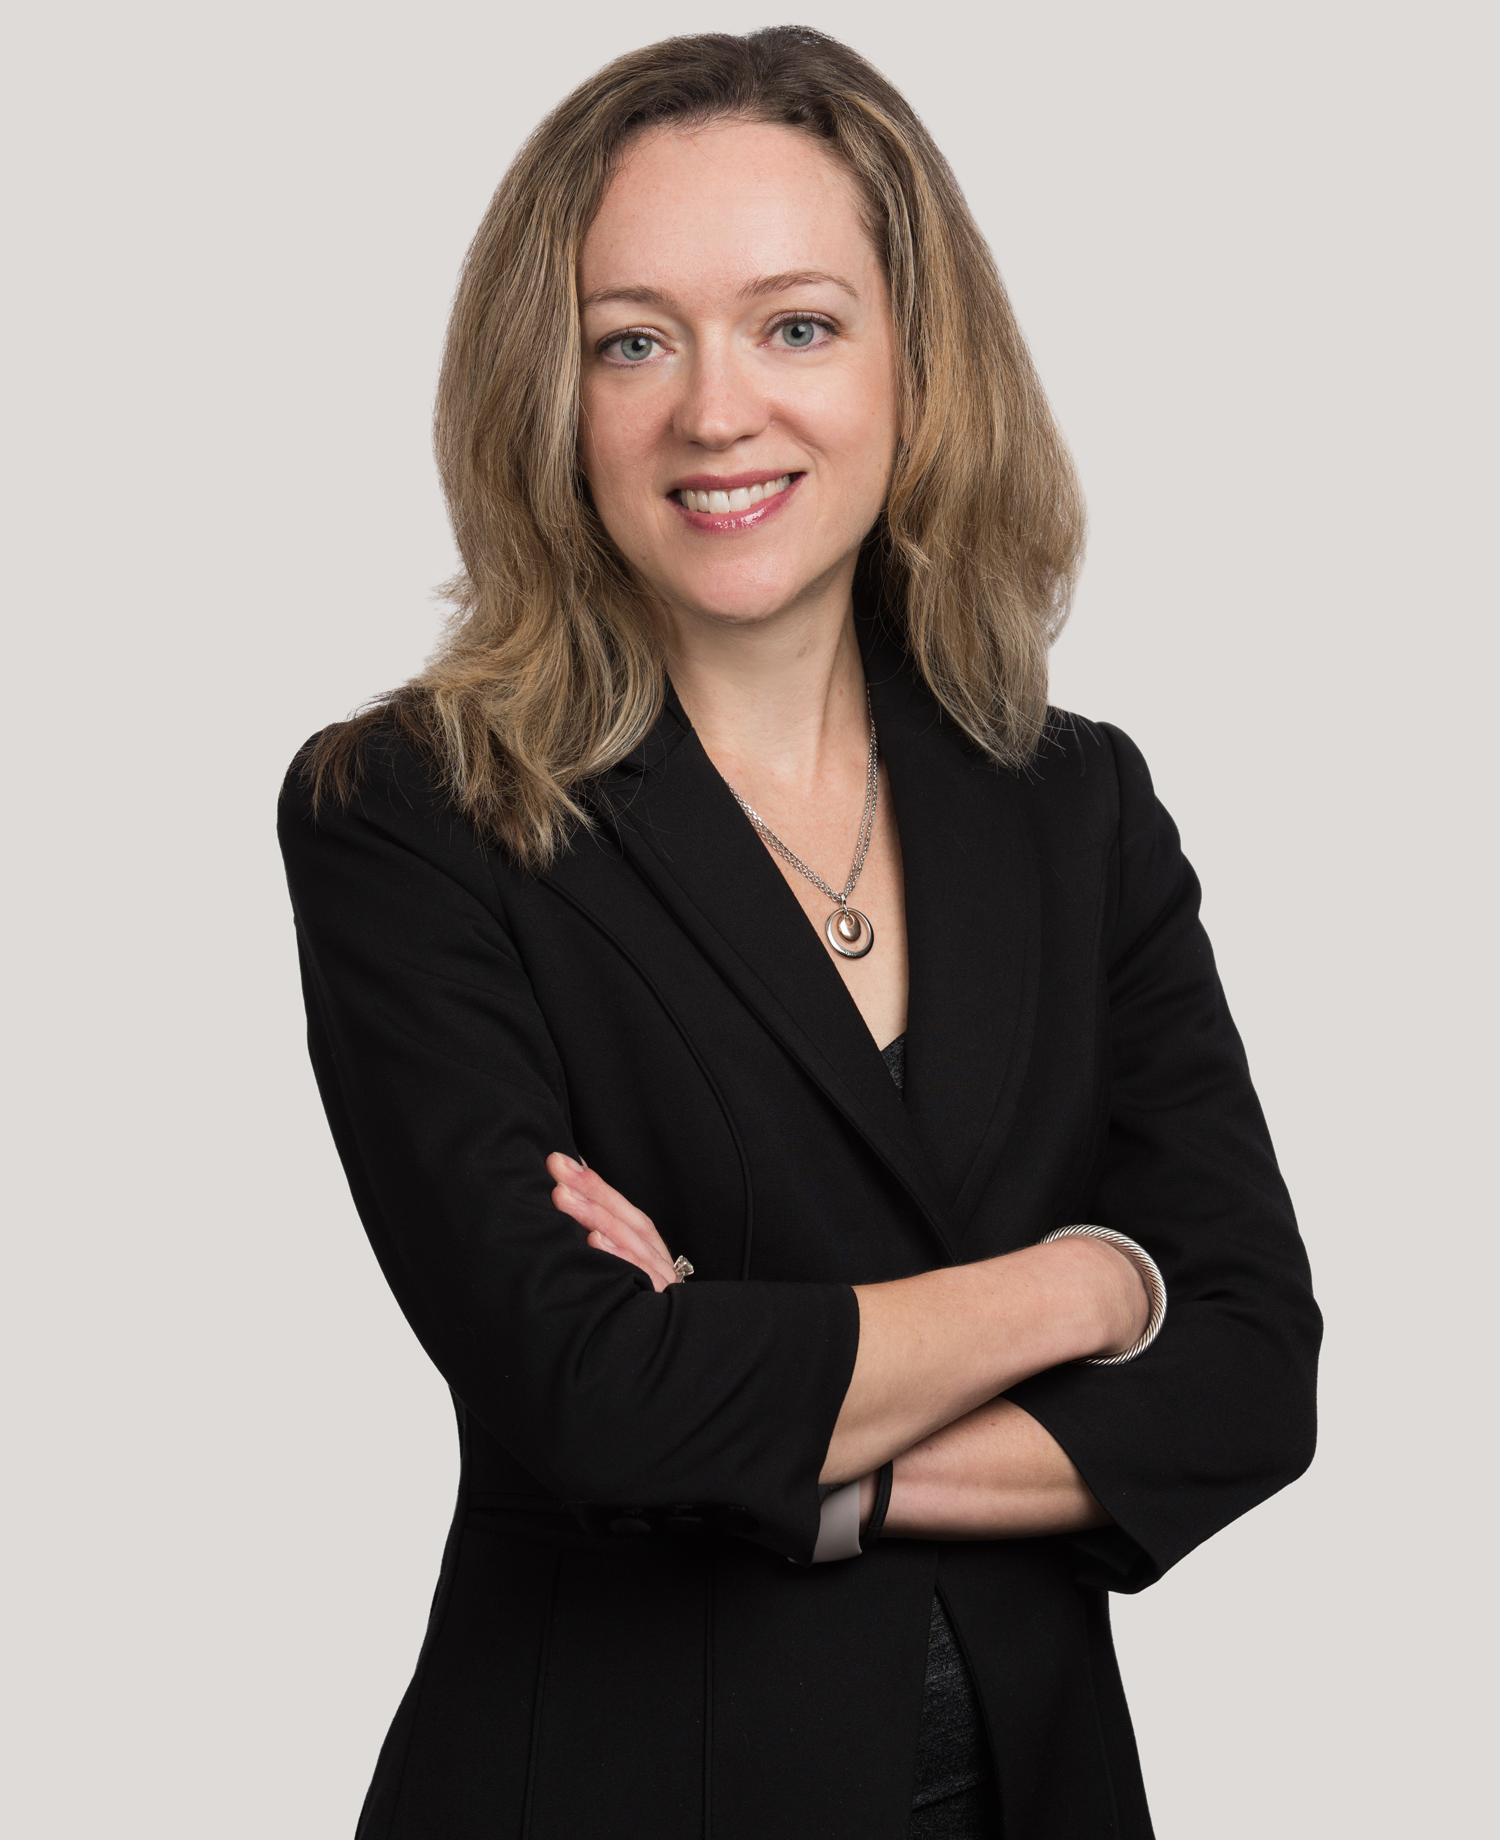 Caitlin M. Kasmar